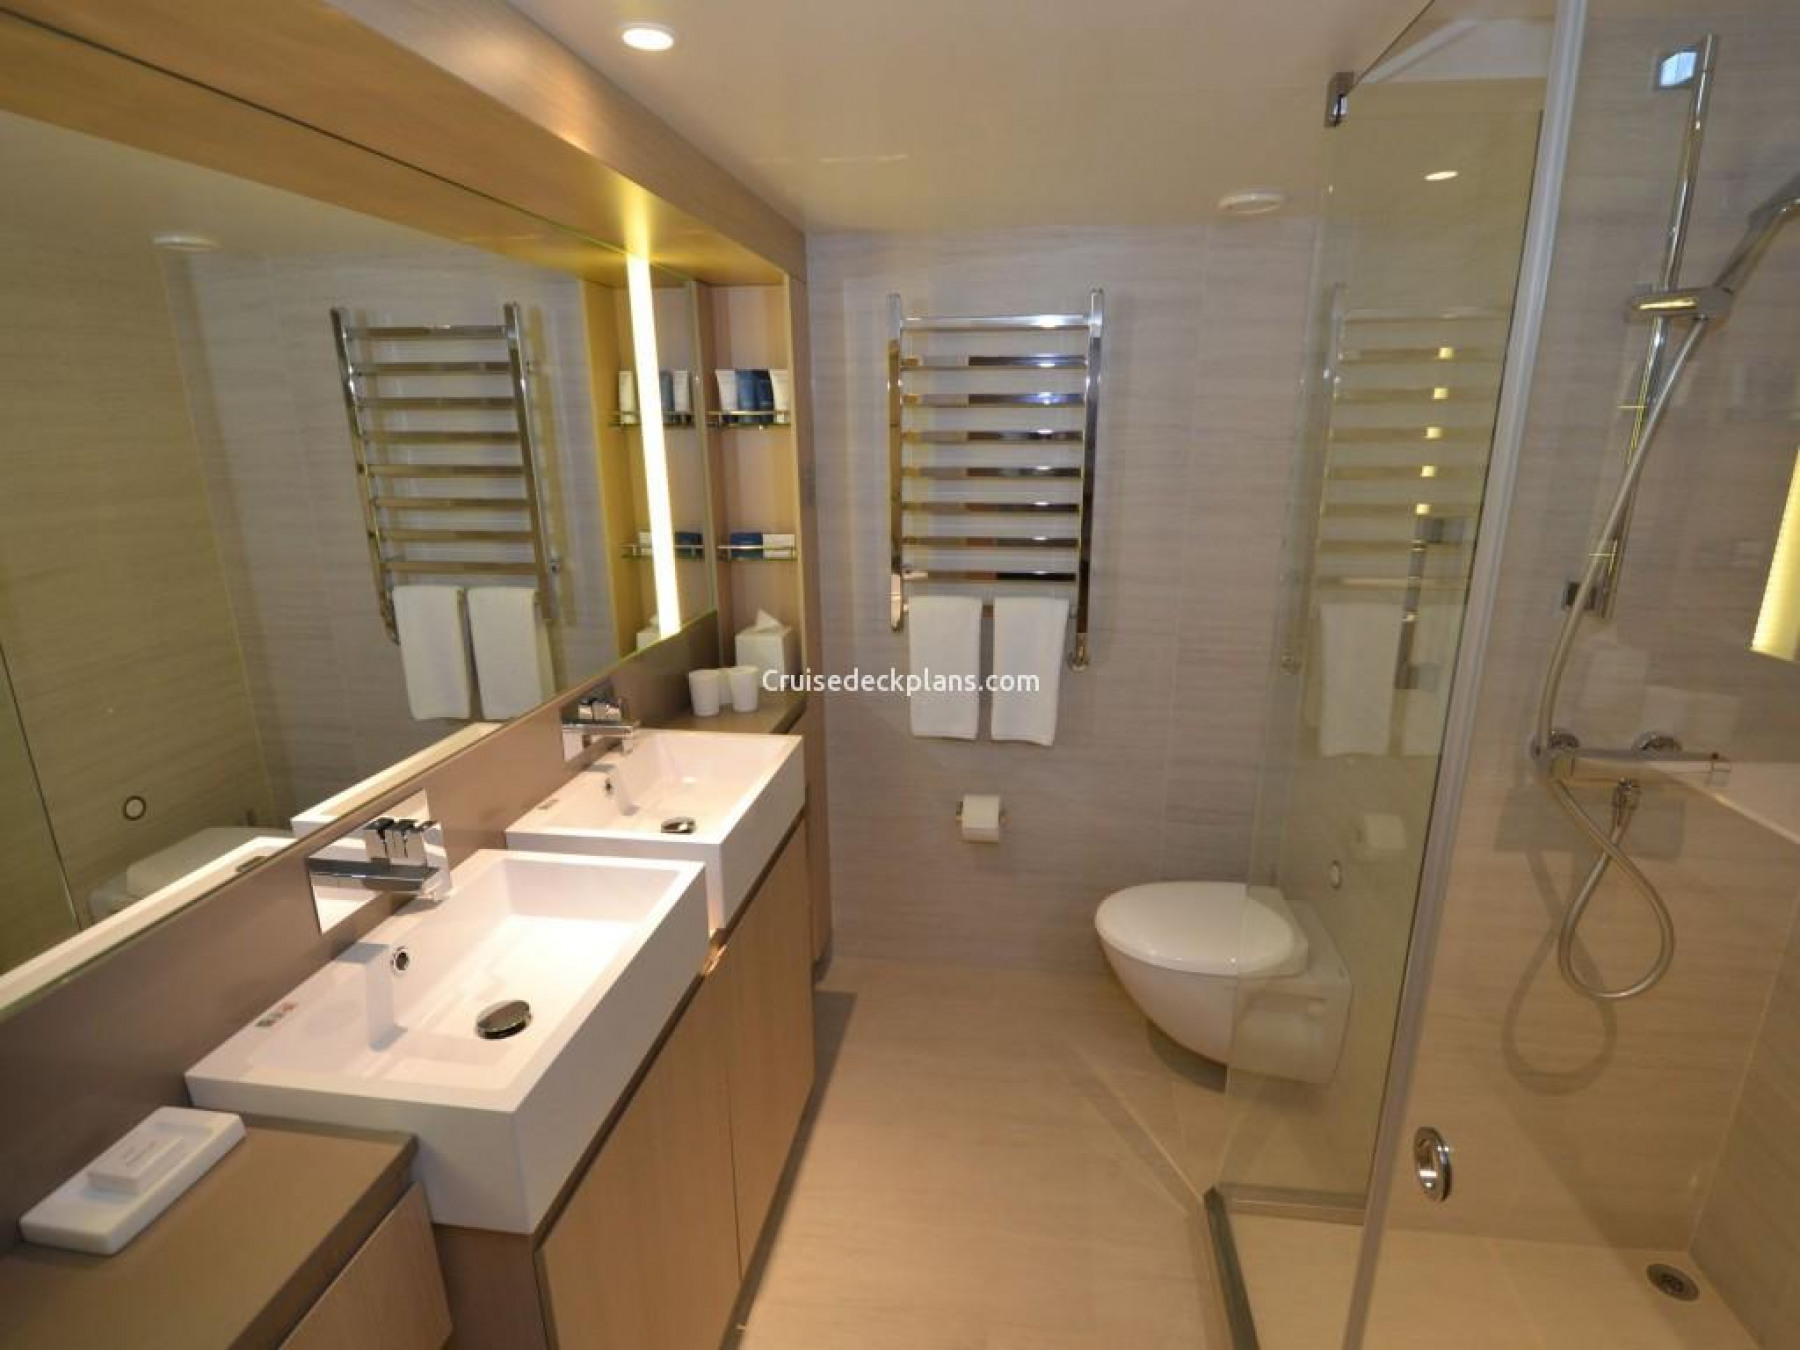 Viking - Star - Accommodation - Penthouse Jnr (3).JPG